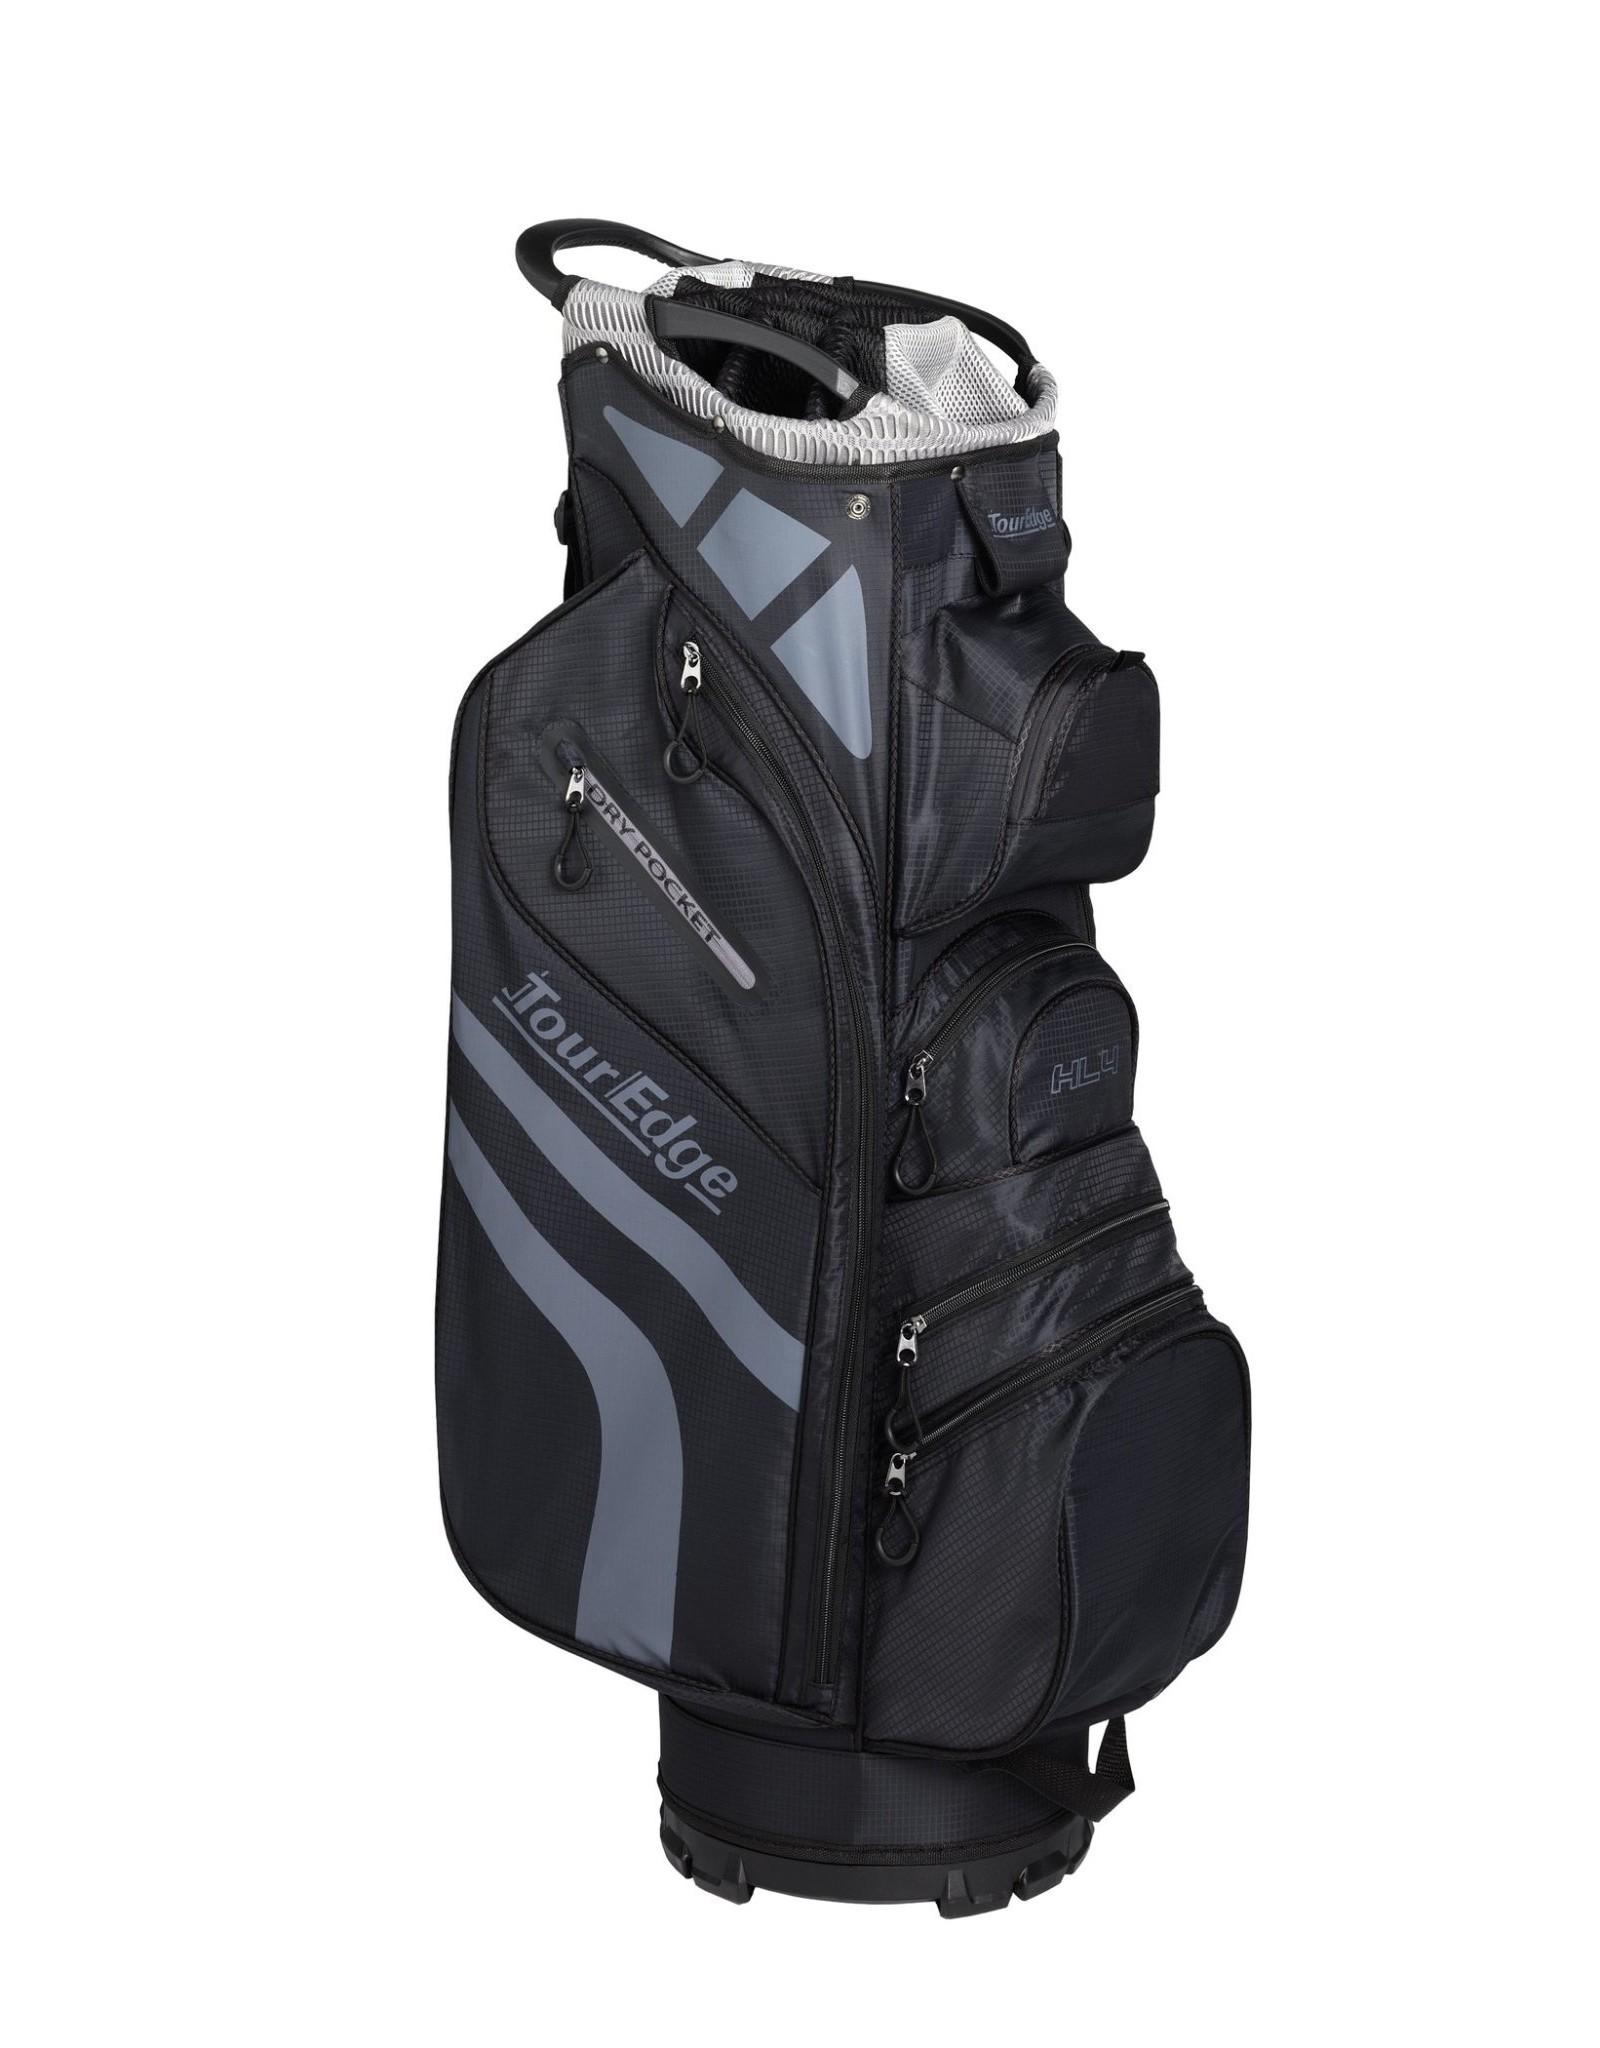 Tour edge/ exotic Tour Edge HL4 Cart Bags